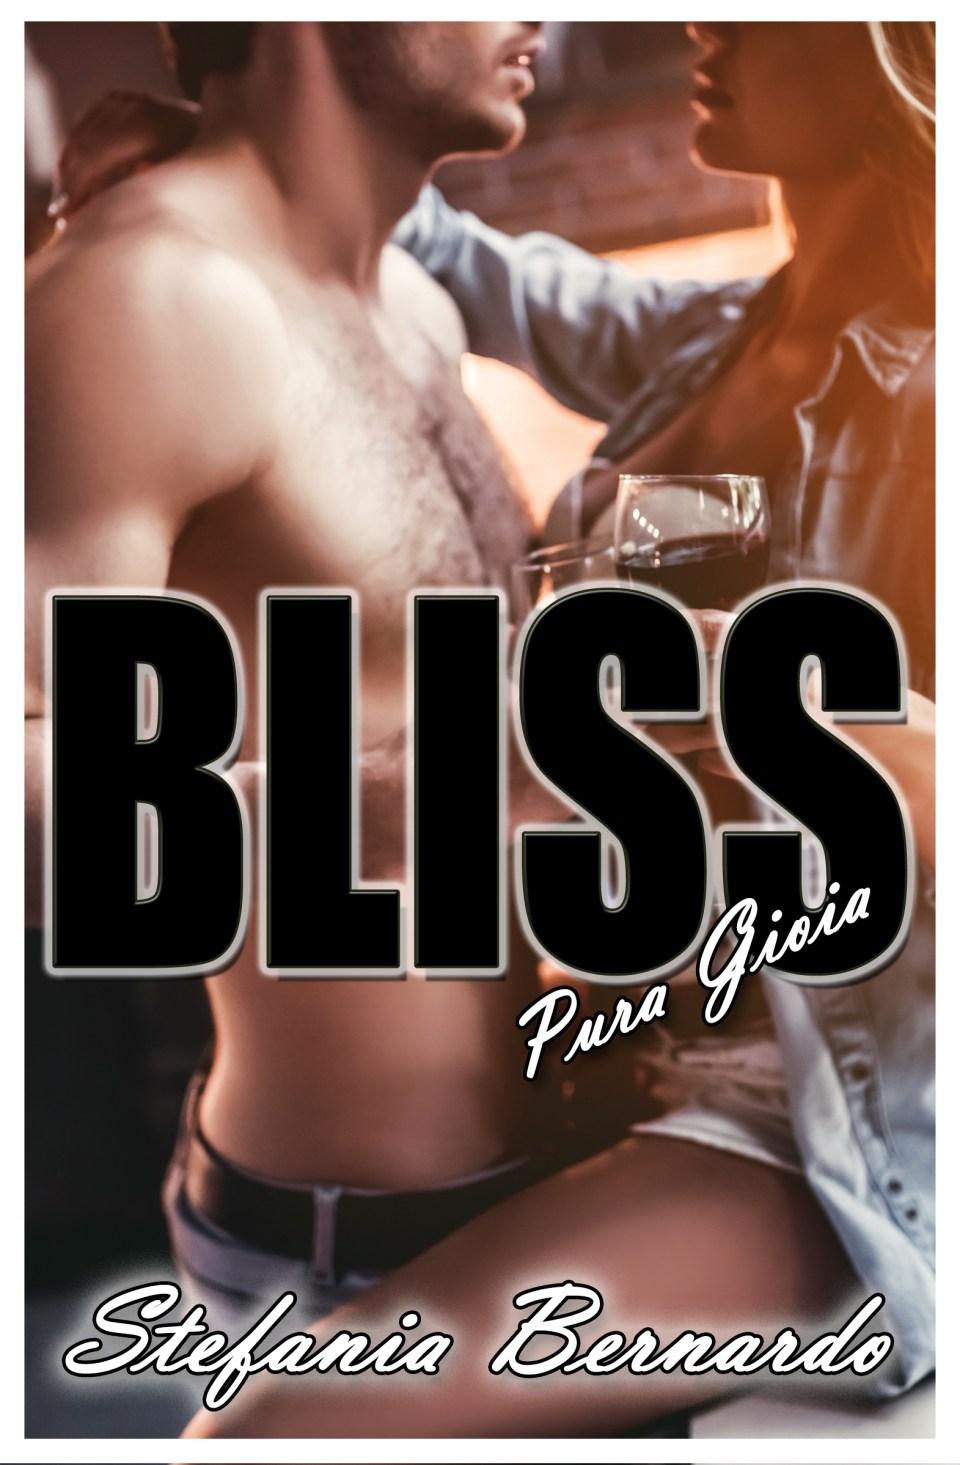 Bliss. Pura gioia Book Cover